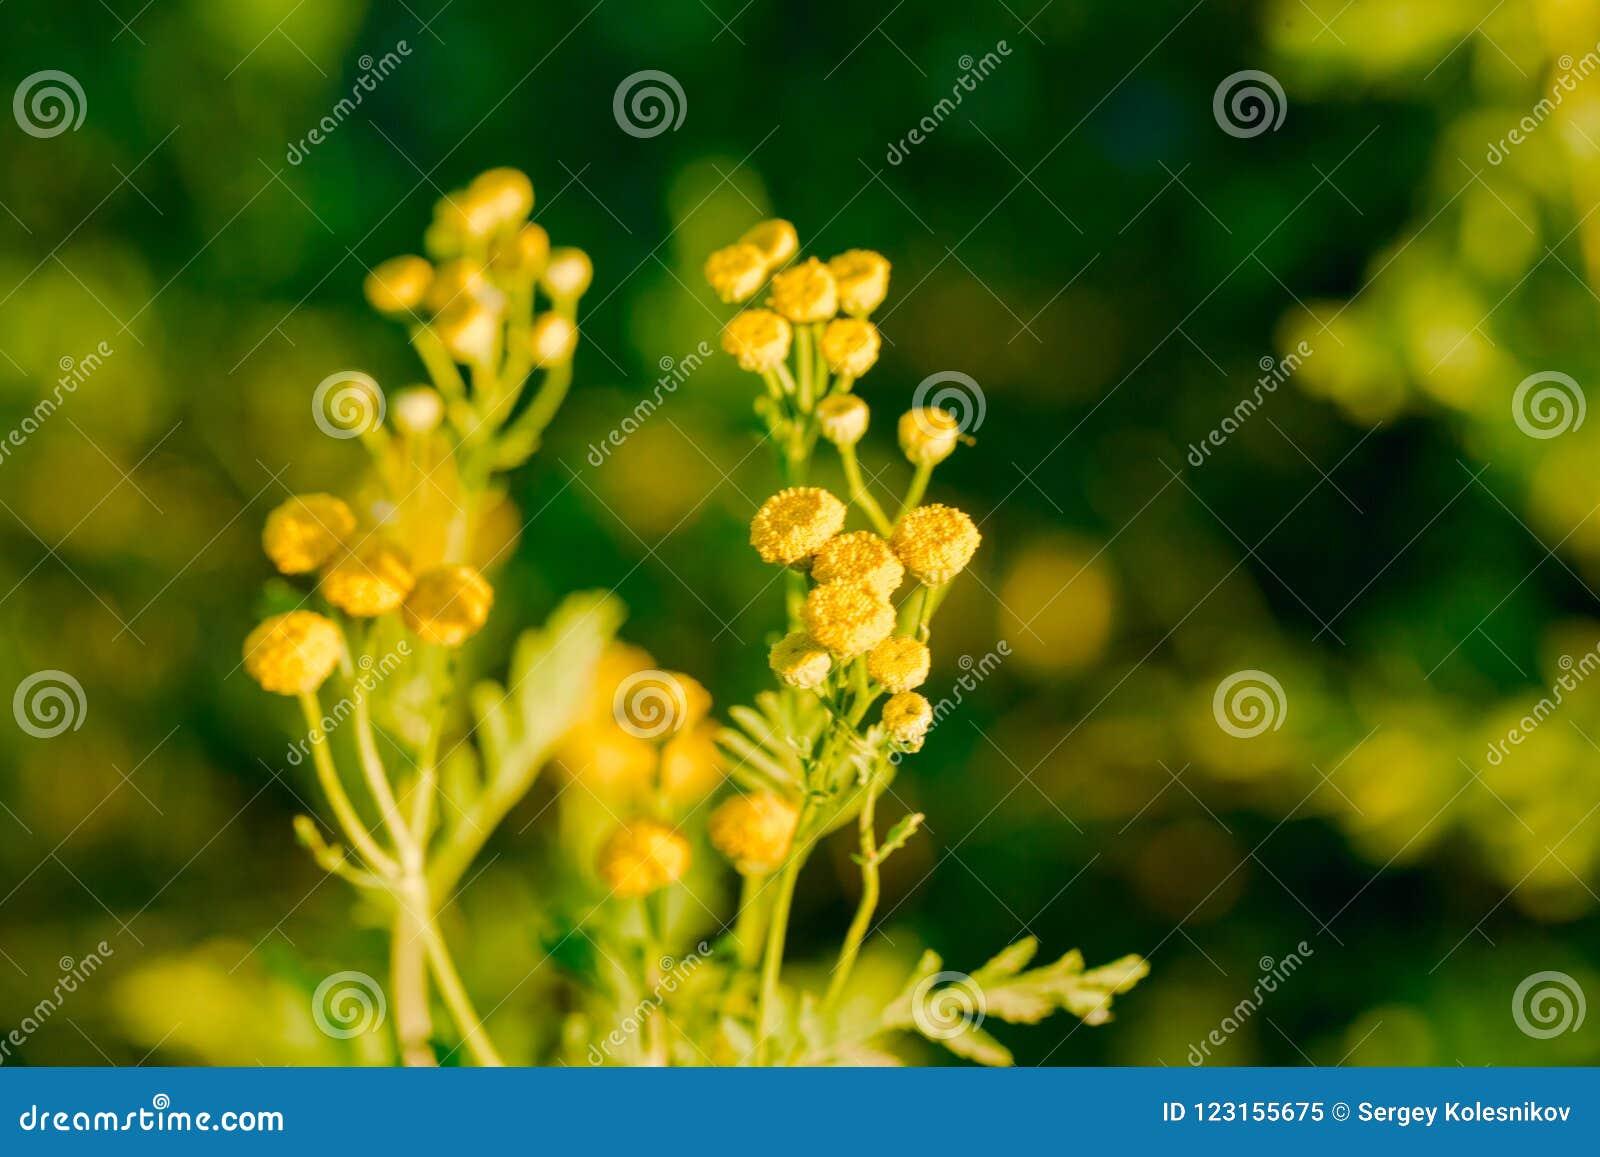 Yellow flowers of common tansy tanacetum vulgare stock image download yellow flowers of common tansy tanacetum vulgare stock image image of blossom mightylinksfo